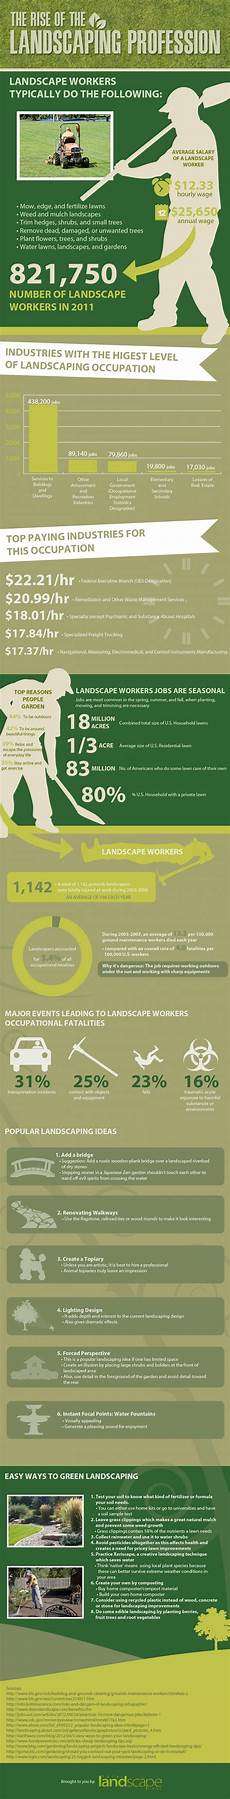 Landscaping Marketing 12 Great Landscaping Marketing Ideas Brandongaille Com